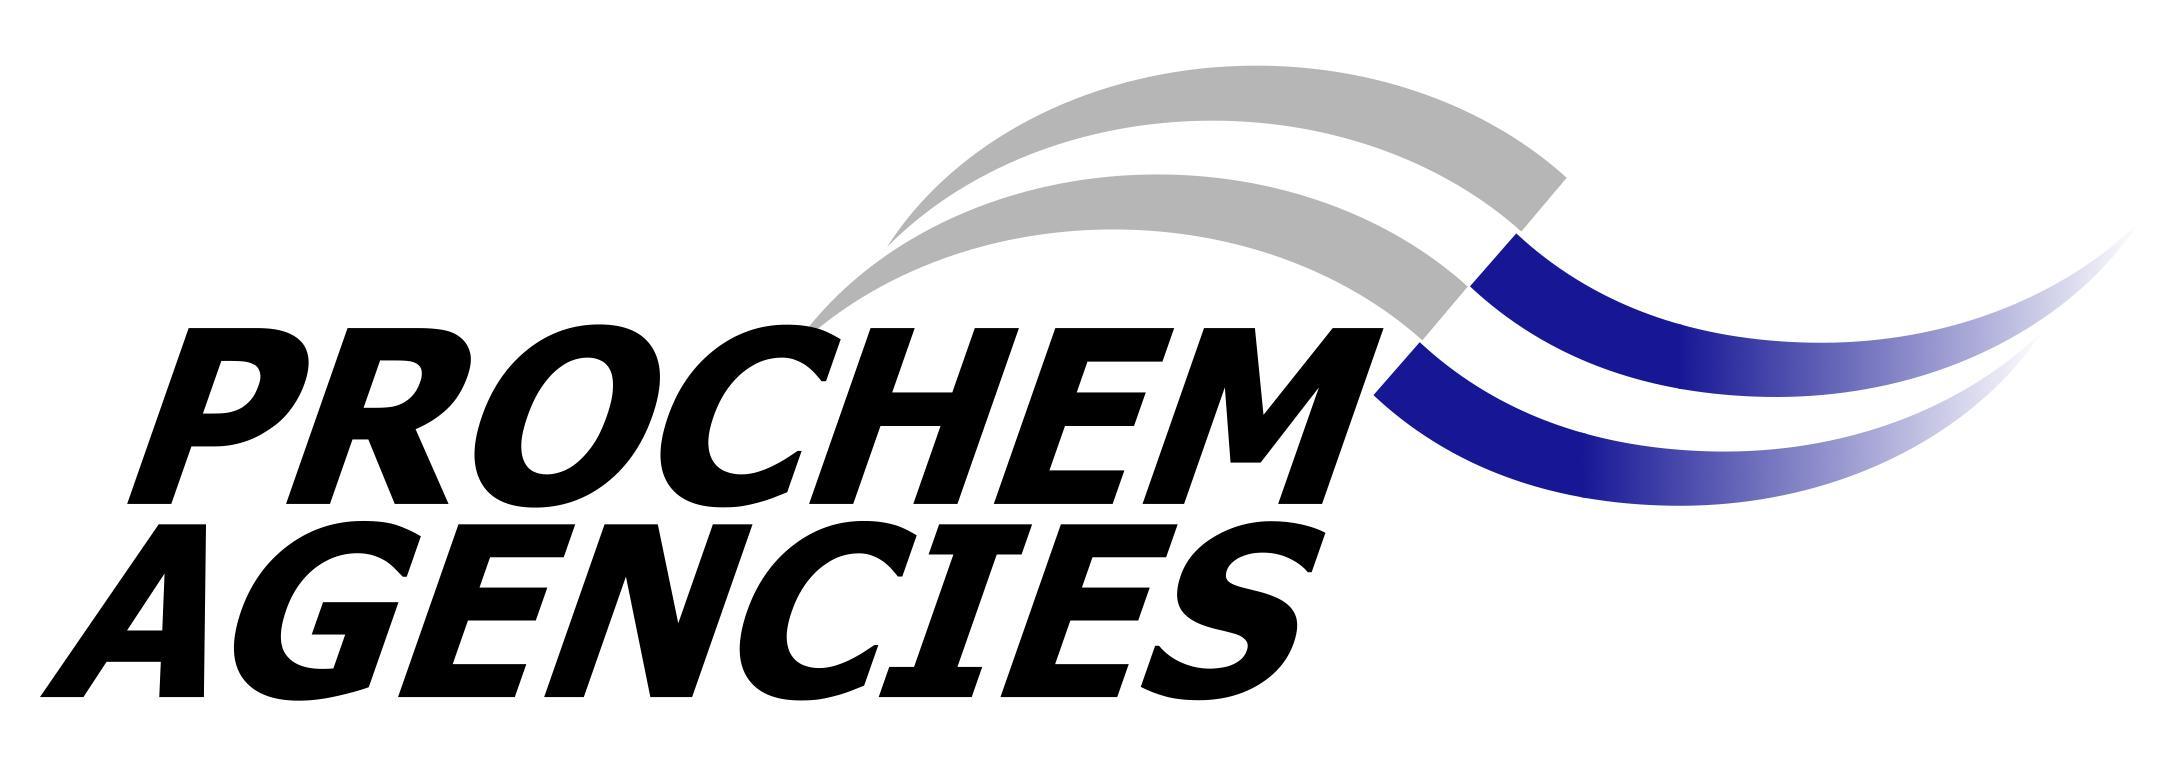 Prochem Agencies Logo